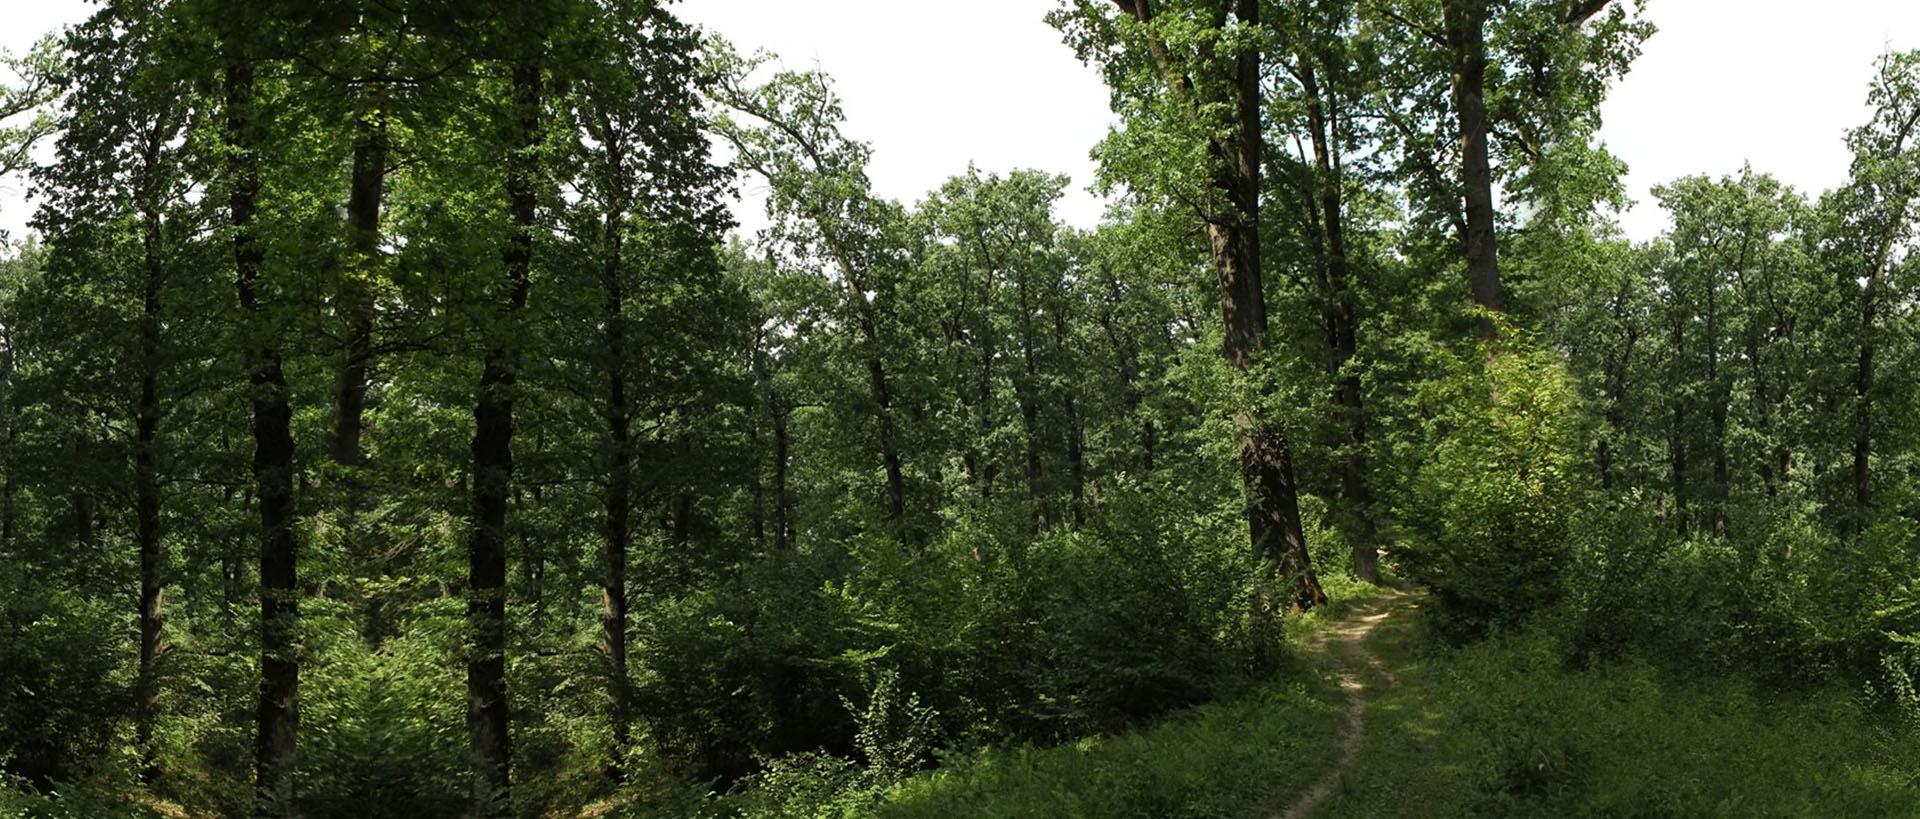 _0000_eco-maramures-mara-cosau-padurea-craiascaRezervatia-Naturalt-Padurea-Craiasca copy 2